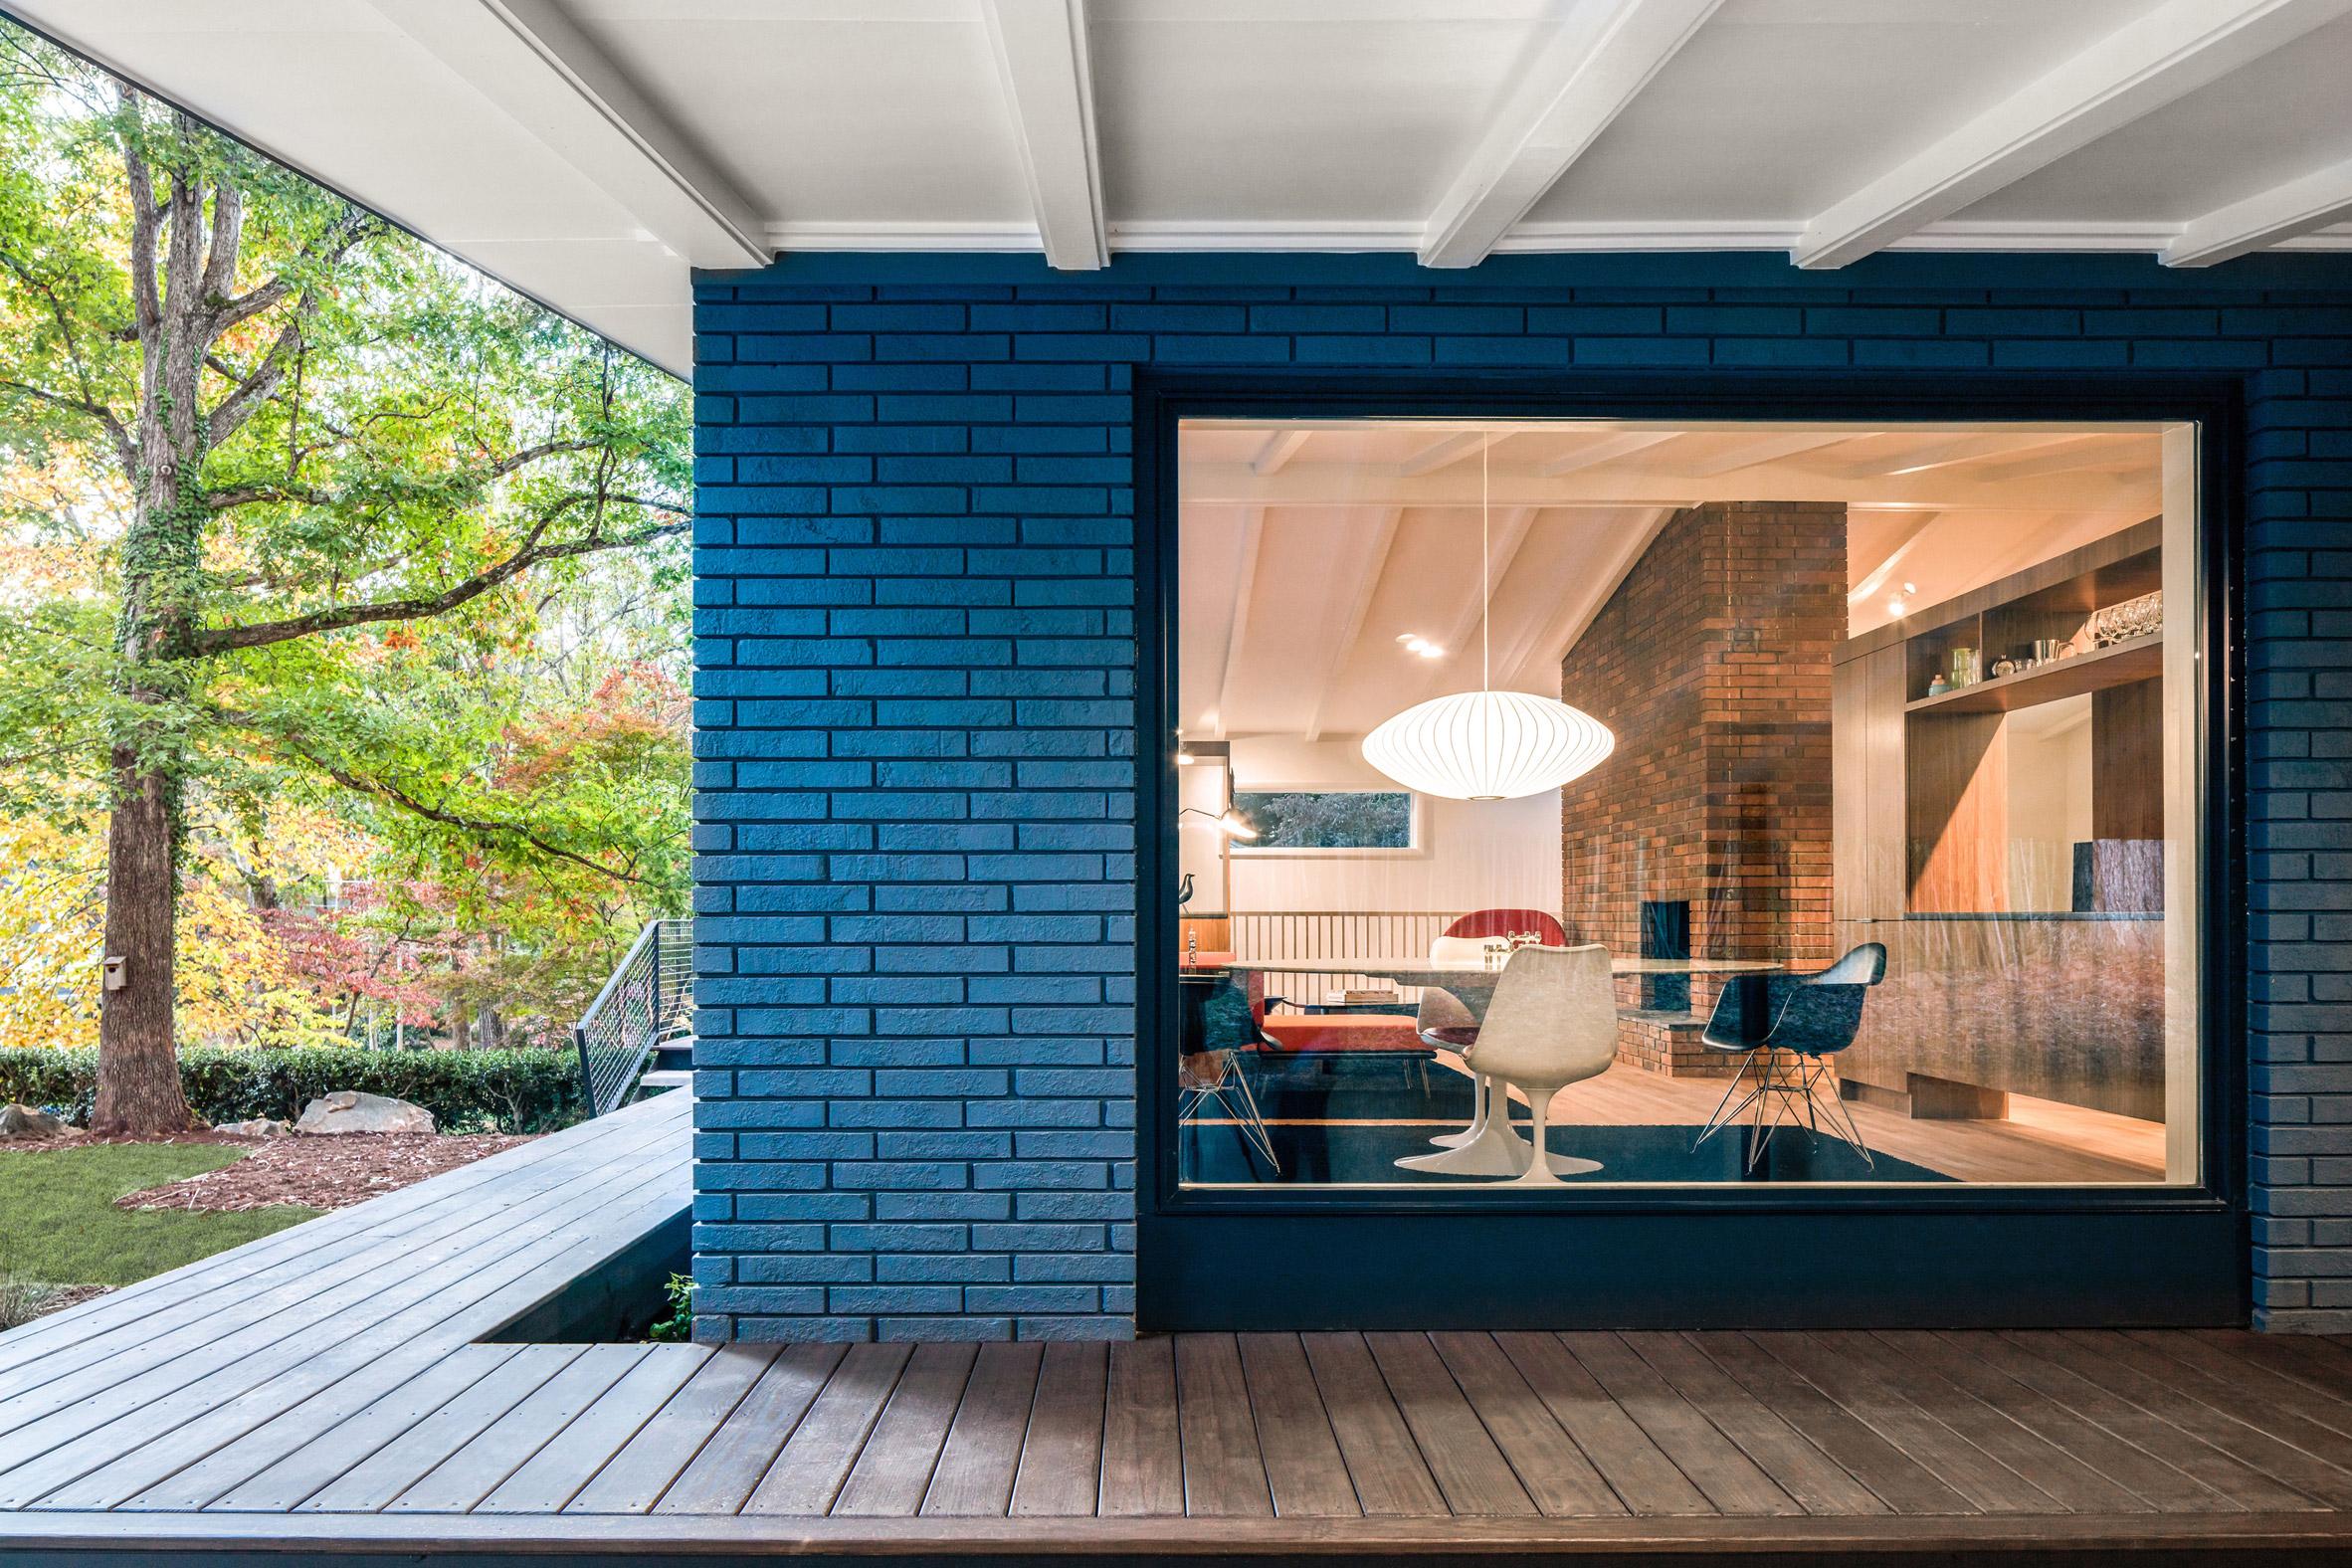 In Situ Studio revives mid-century modern home in North Carolina